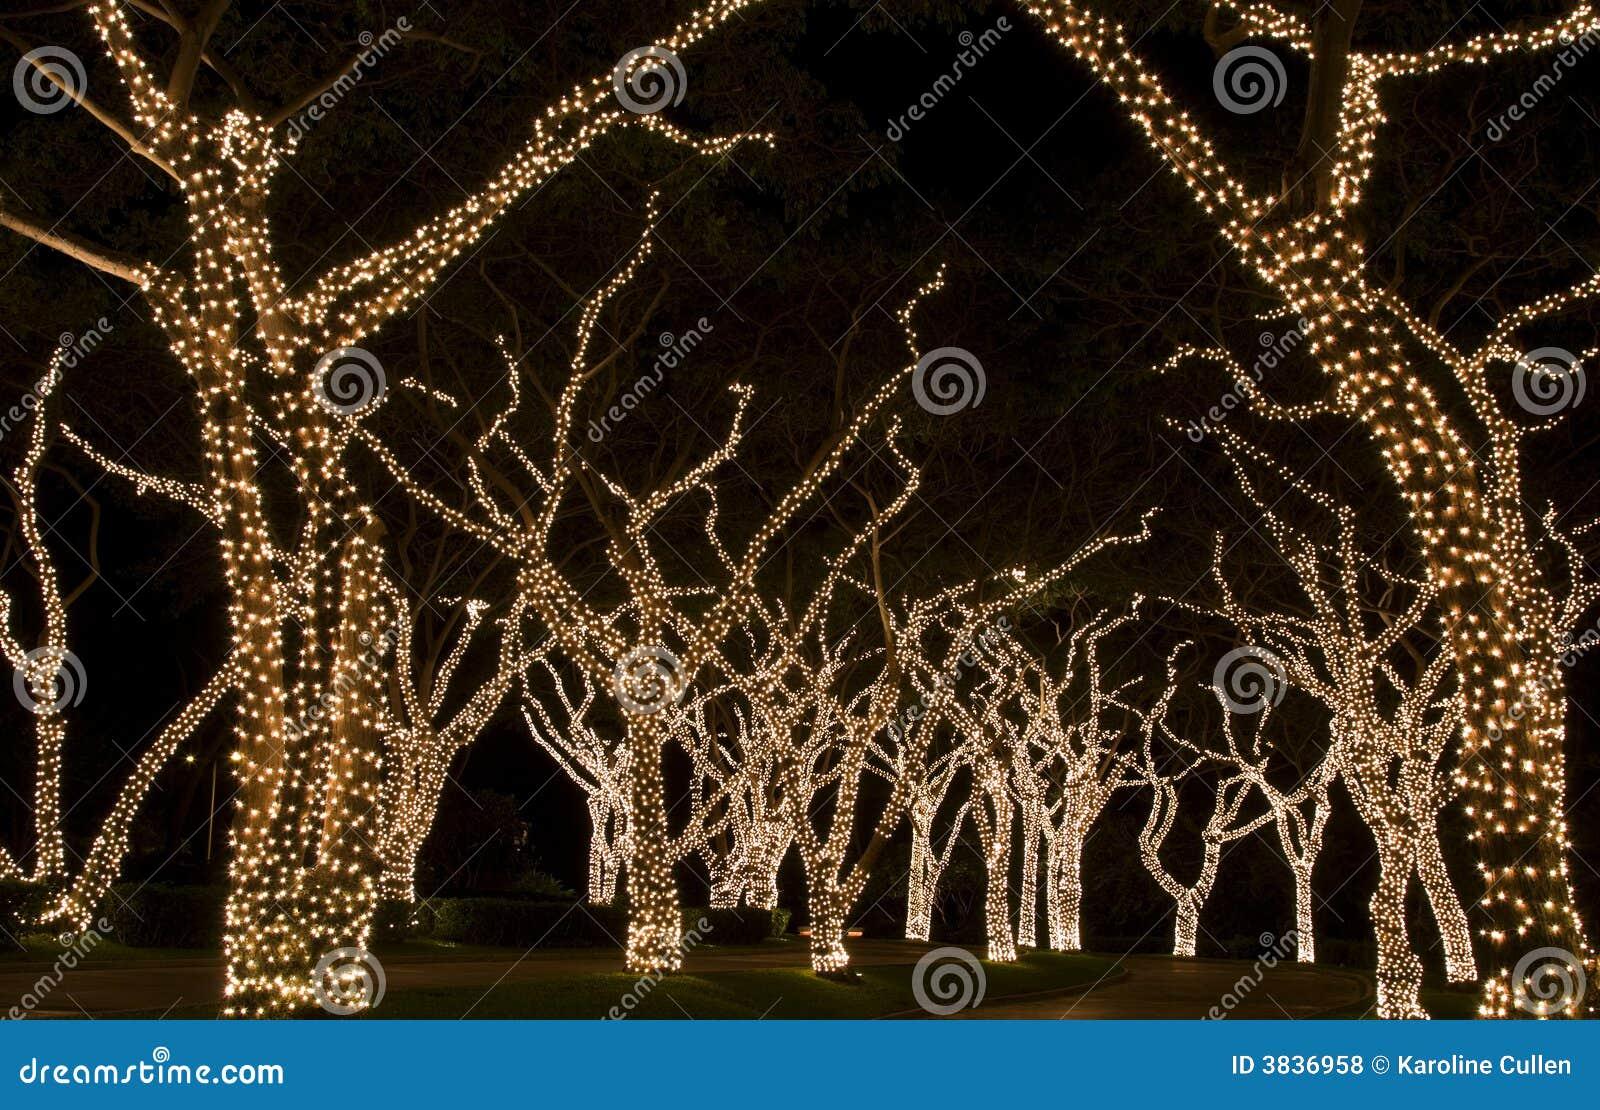 Festive Lights On Trees Royalty Free Stock Photos Image